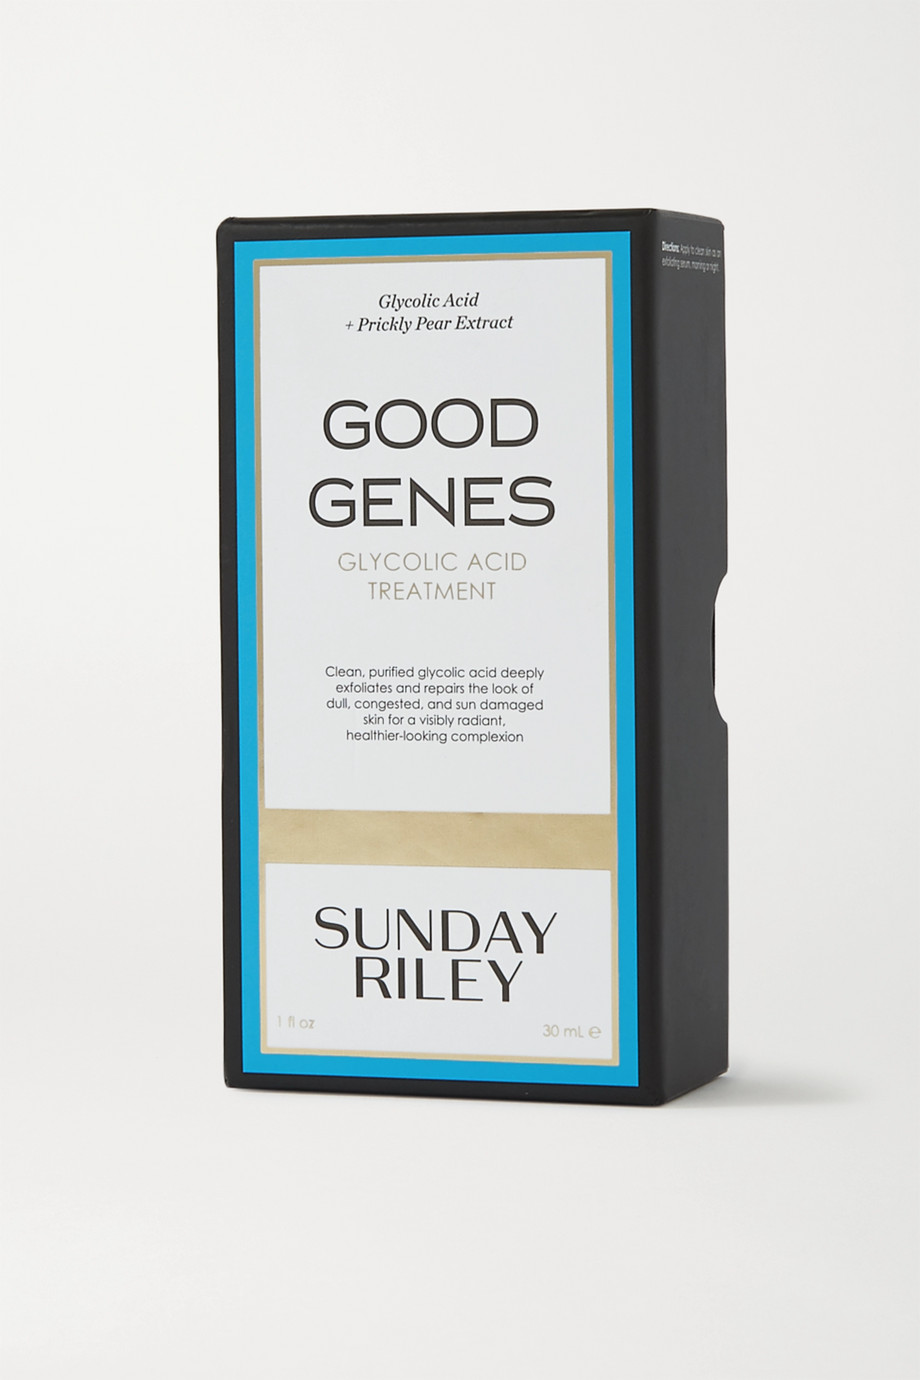 Sunday Riley Good Genes Glycolic Acid Treatment, 30 ml – Anti-Aging-Pflege